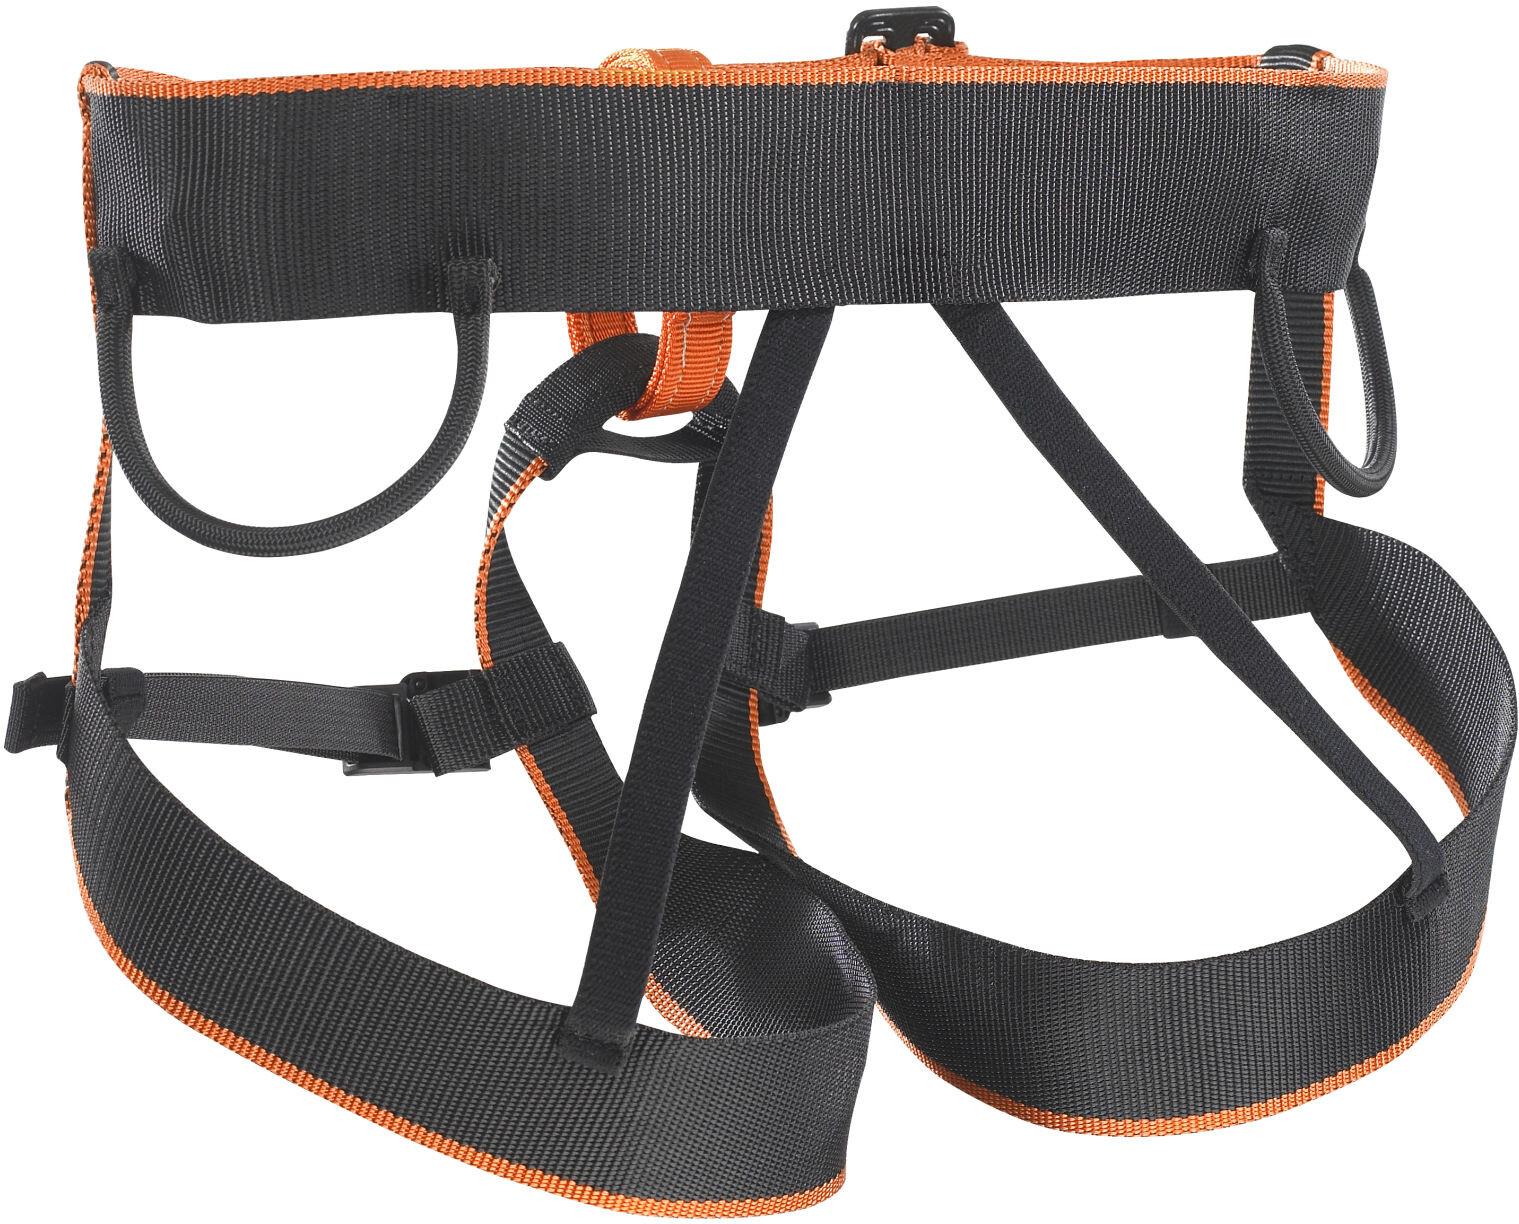 Skylotec Klettergurt Kinder : Skylotec pyrit harness kids black orange campz.de